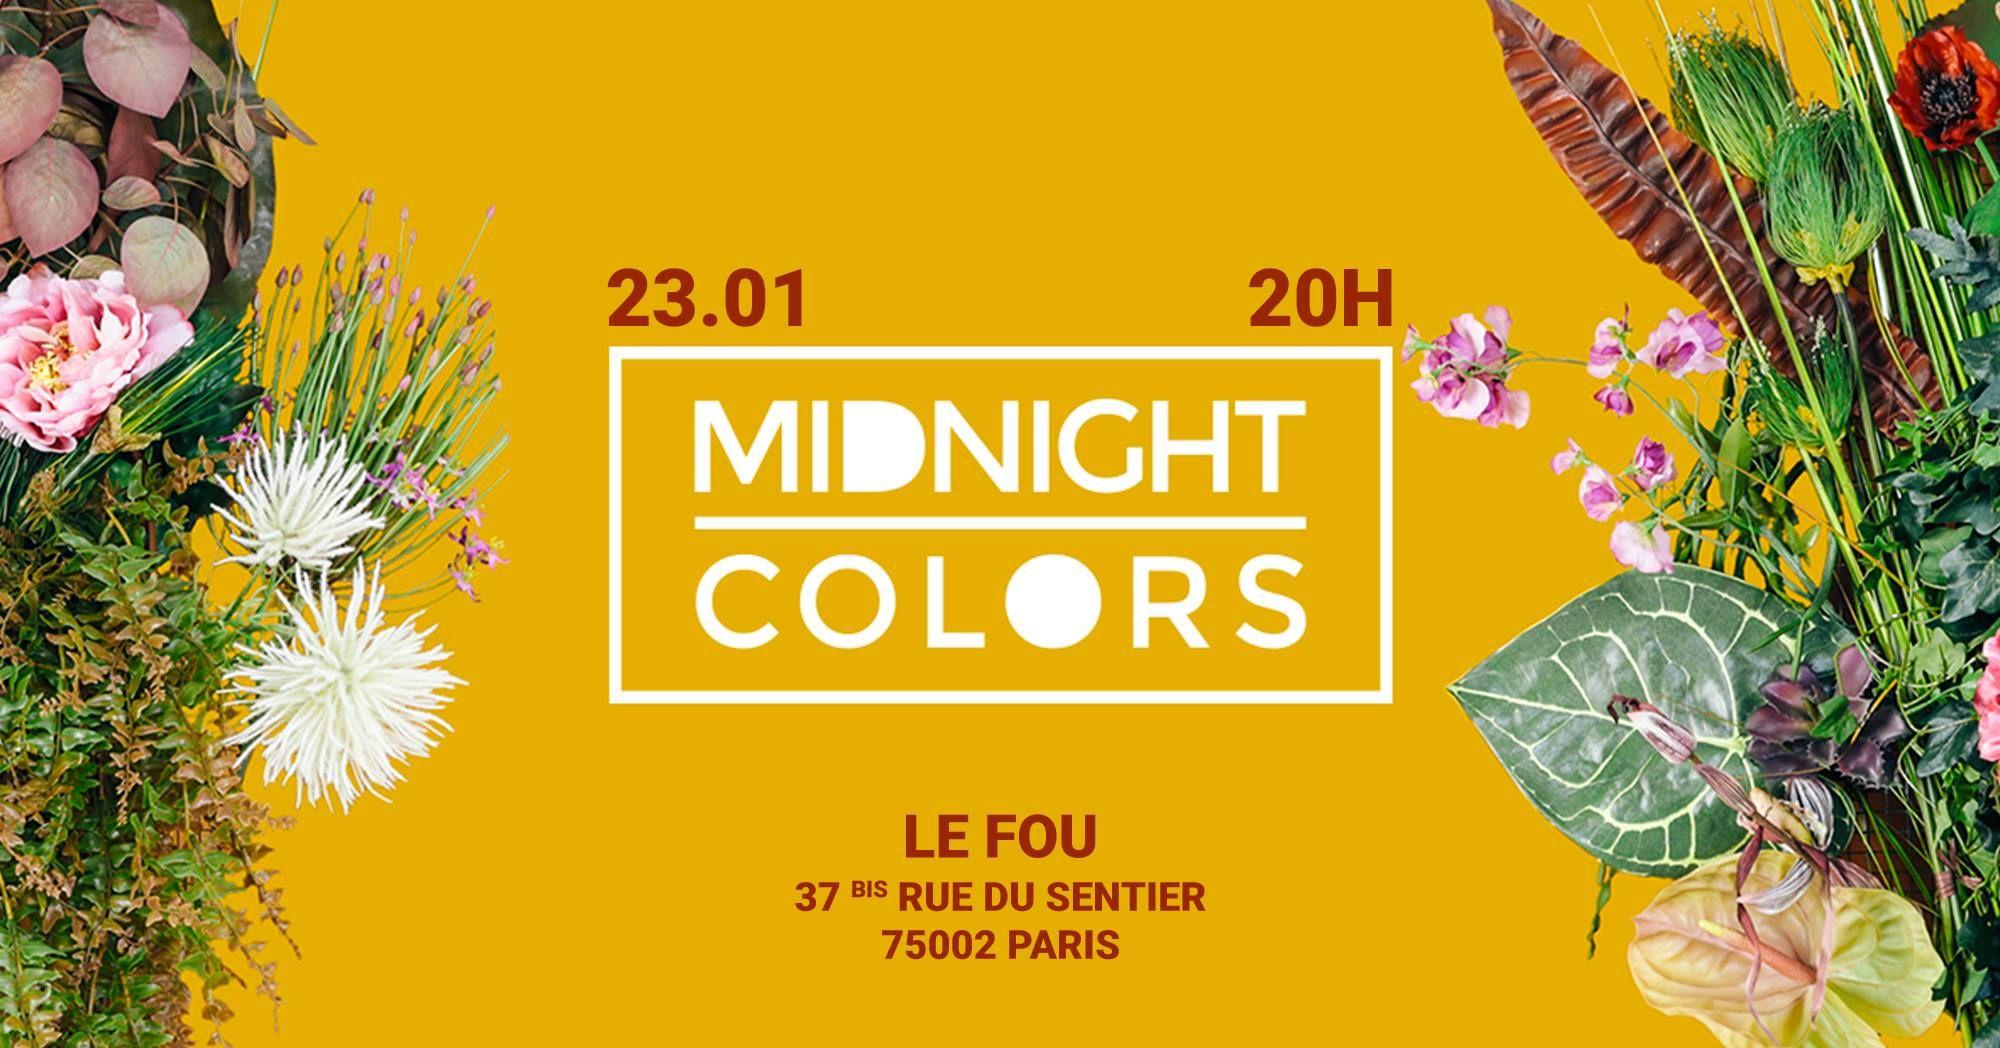 Paris Food & Drink Events: Midnight Colors au Fou January 23 @ 20:00 - 22:30